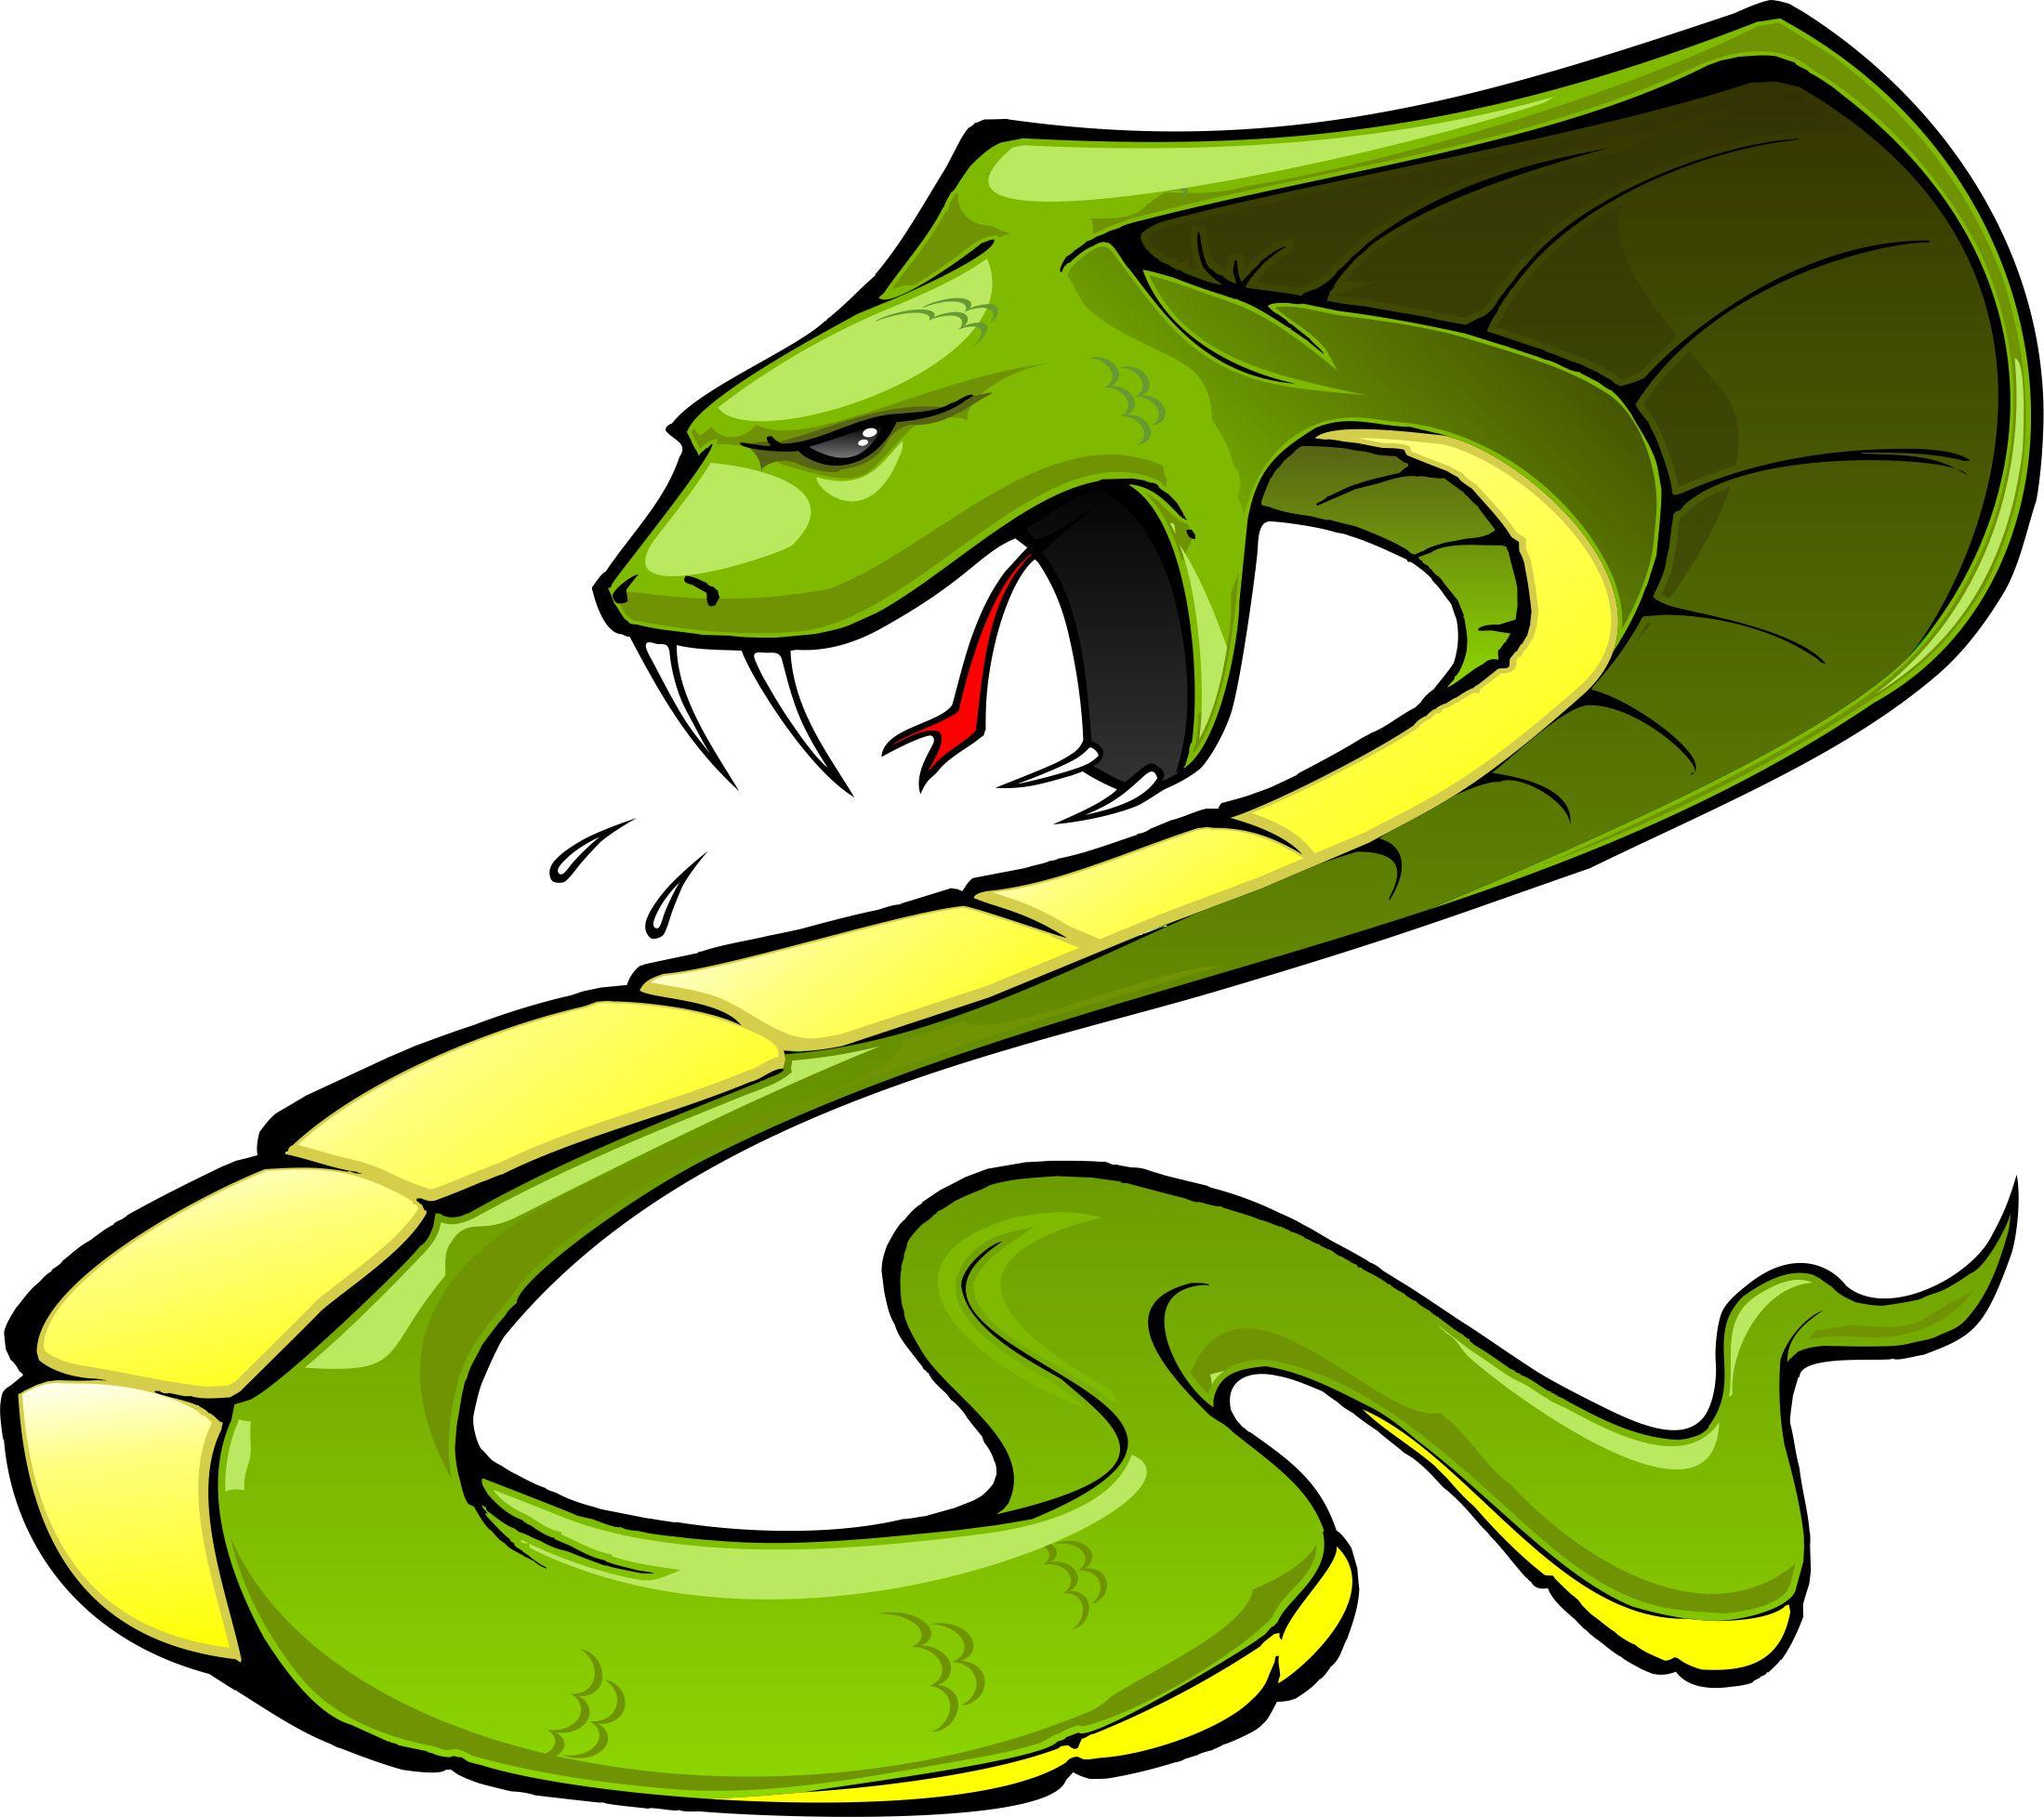 Viper Snake Logo Images .-Viper Snake Logo Images .-0